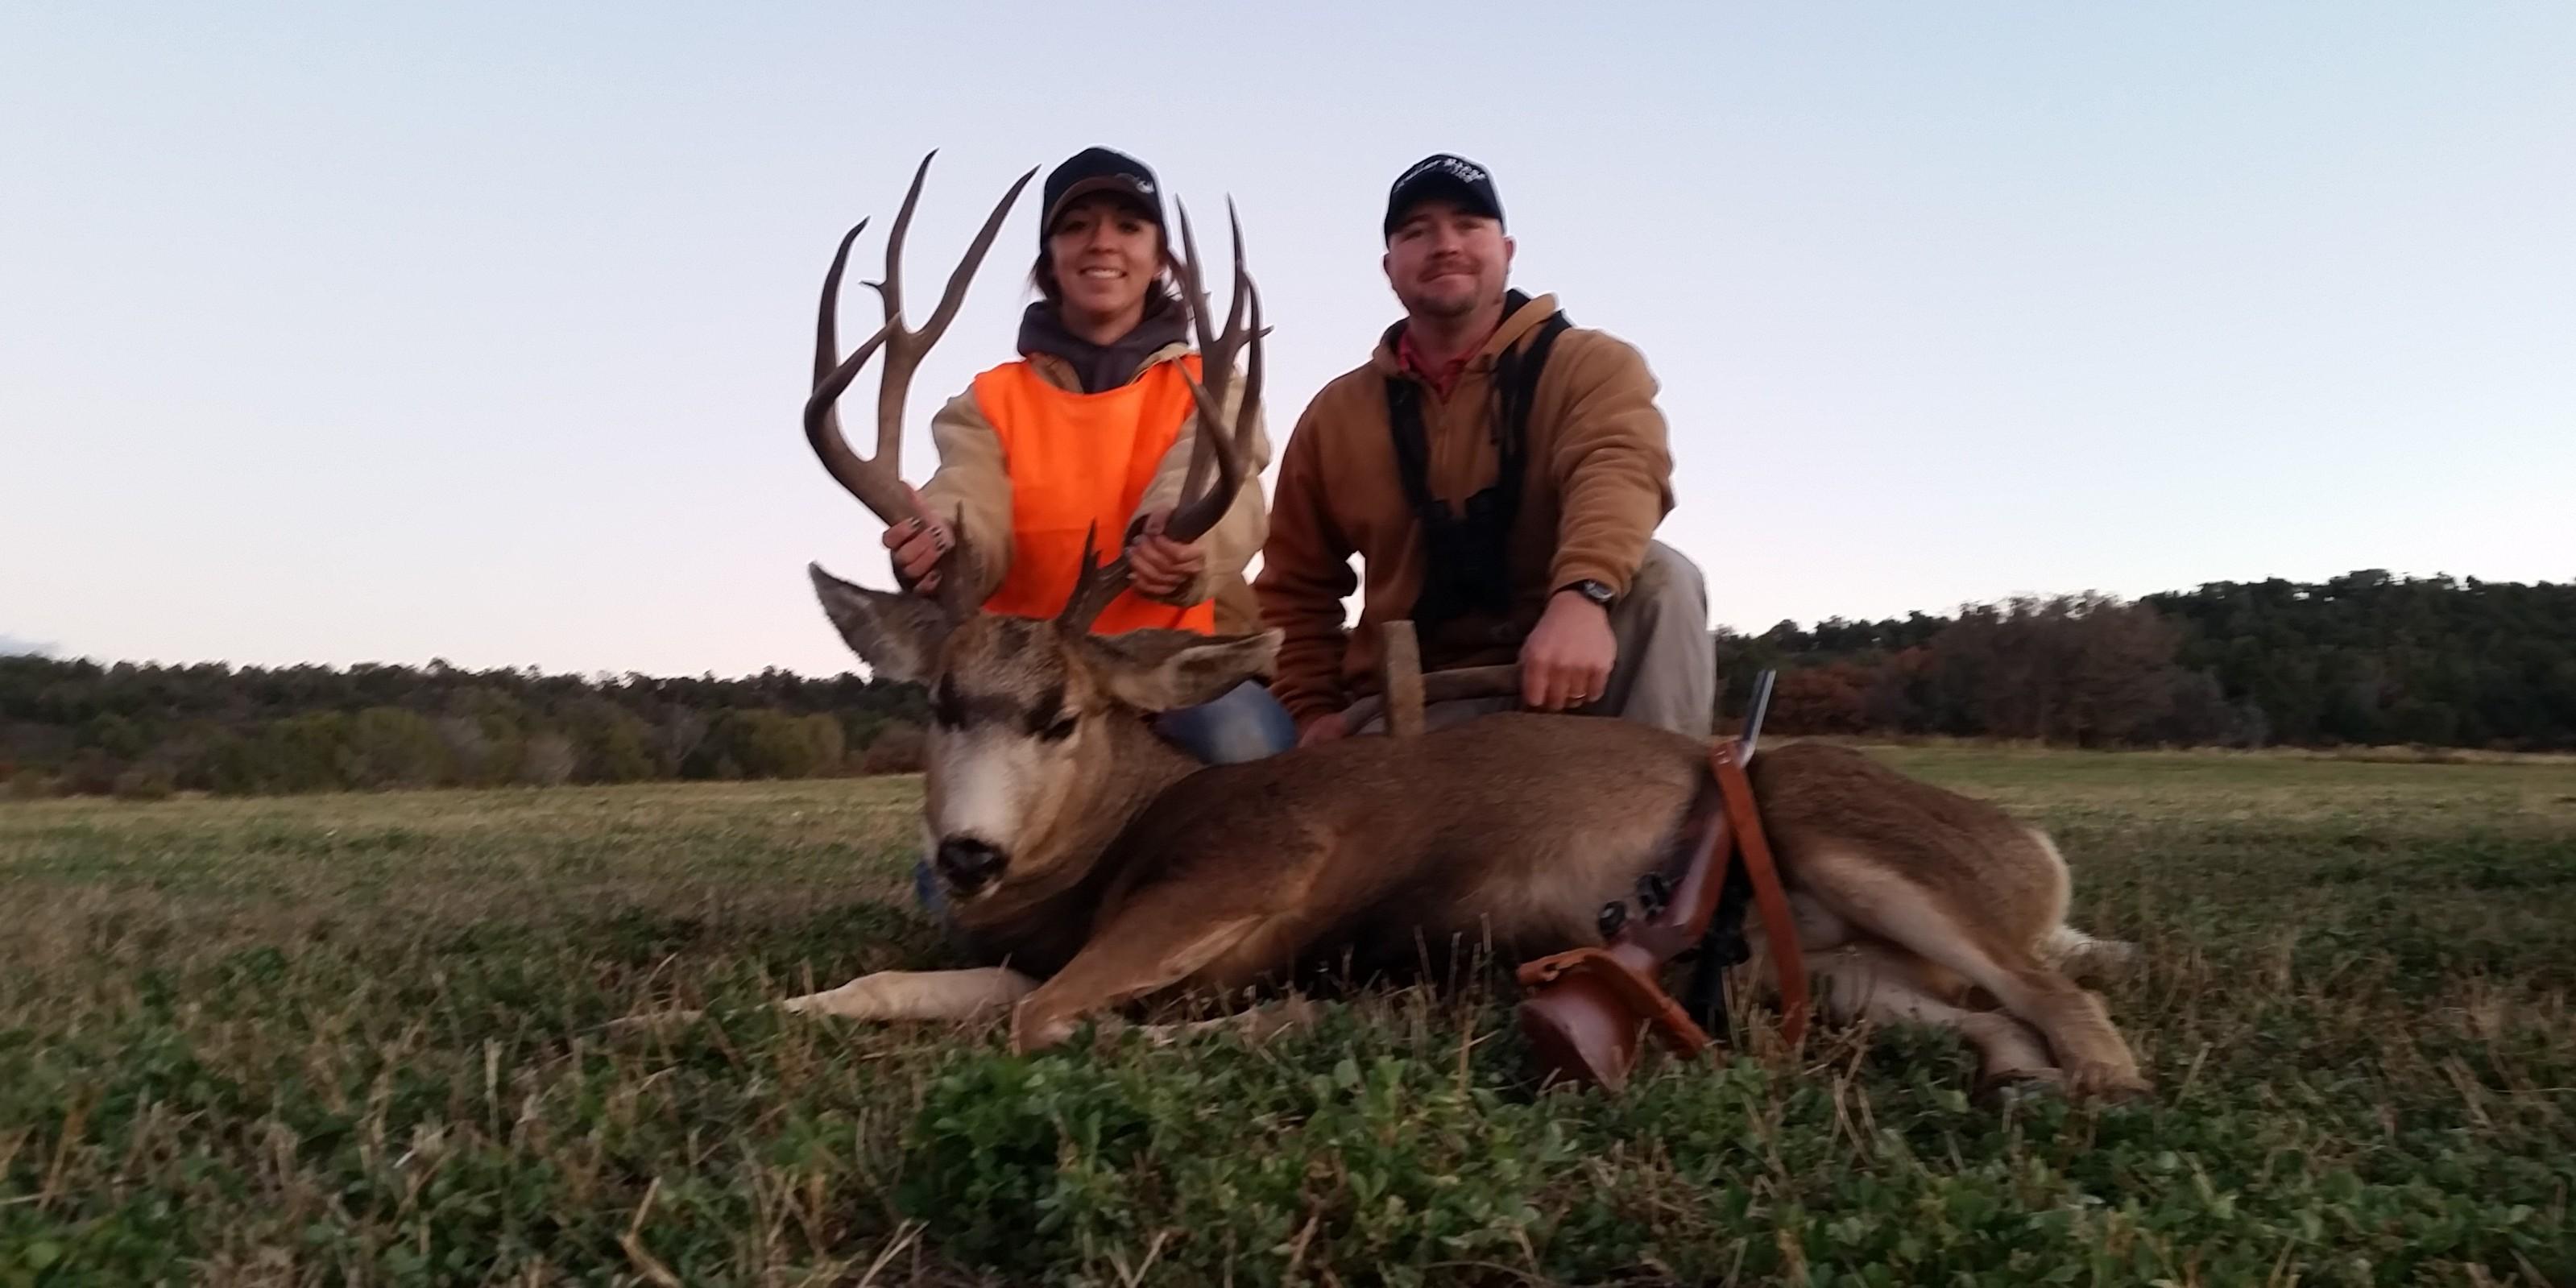 Antler Ridge Outfitting | Colorado's Best Hunting | Antler